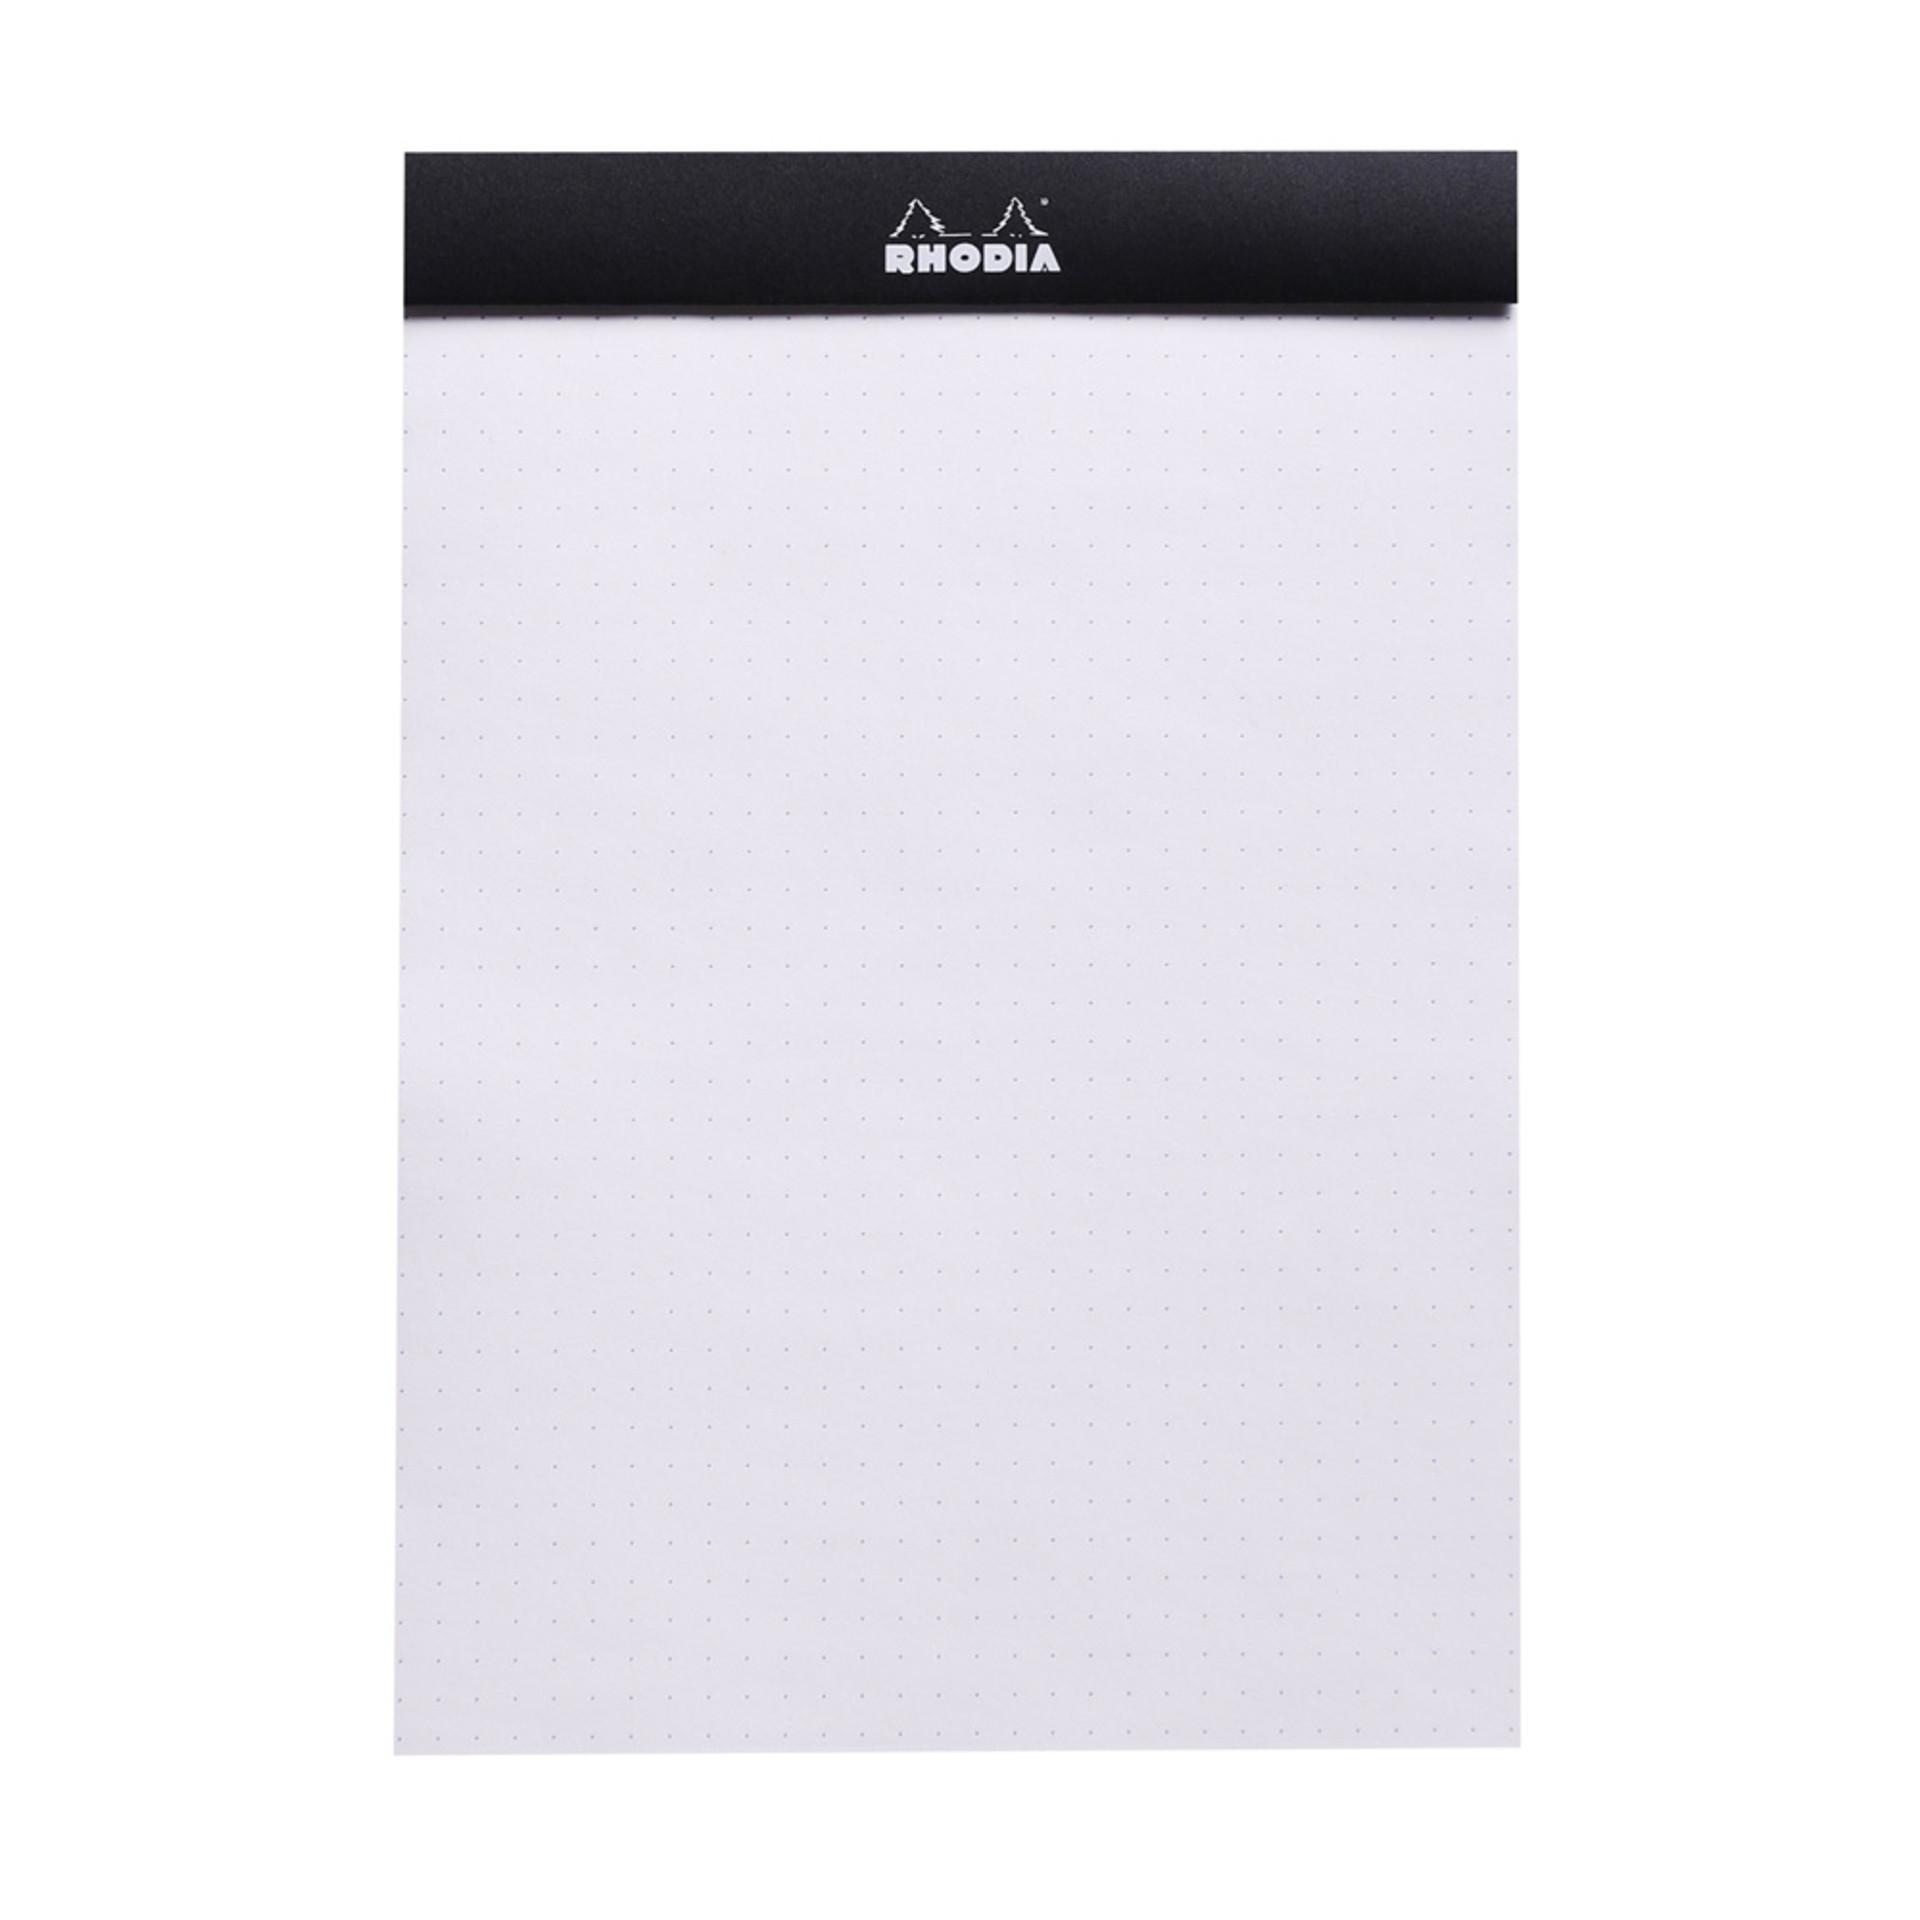 "Rhodia DotPad Notepad Stapled Black 6""x81/4"""